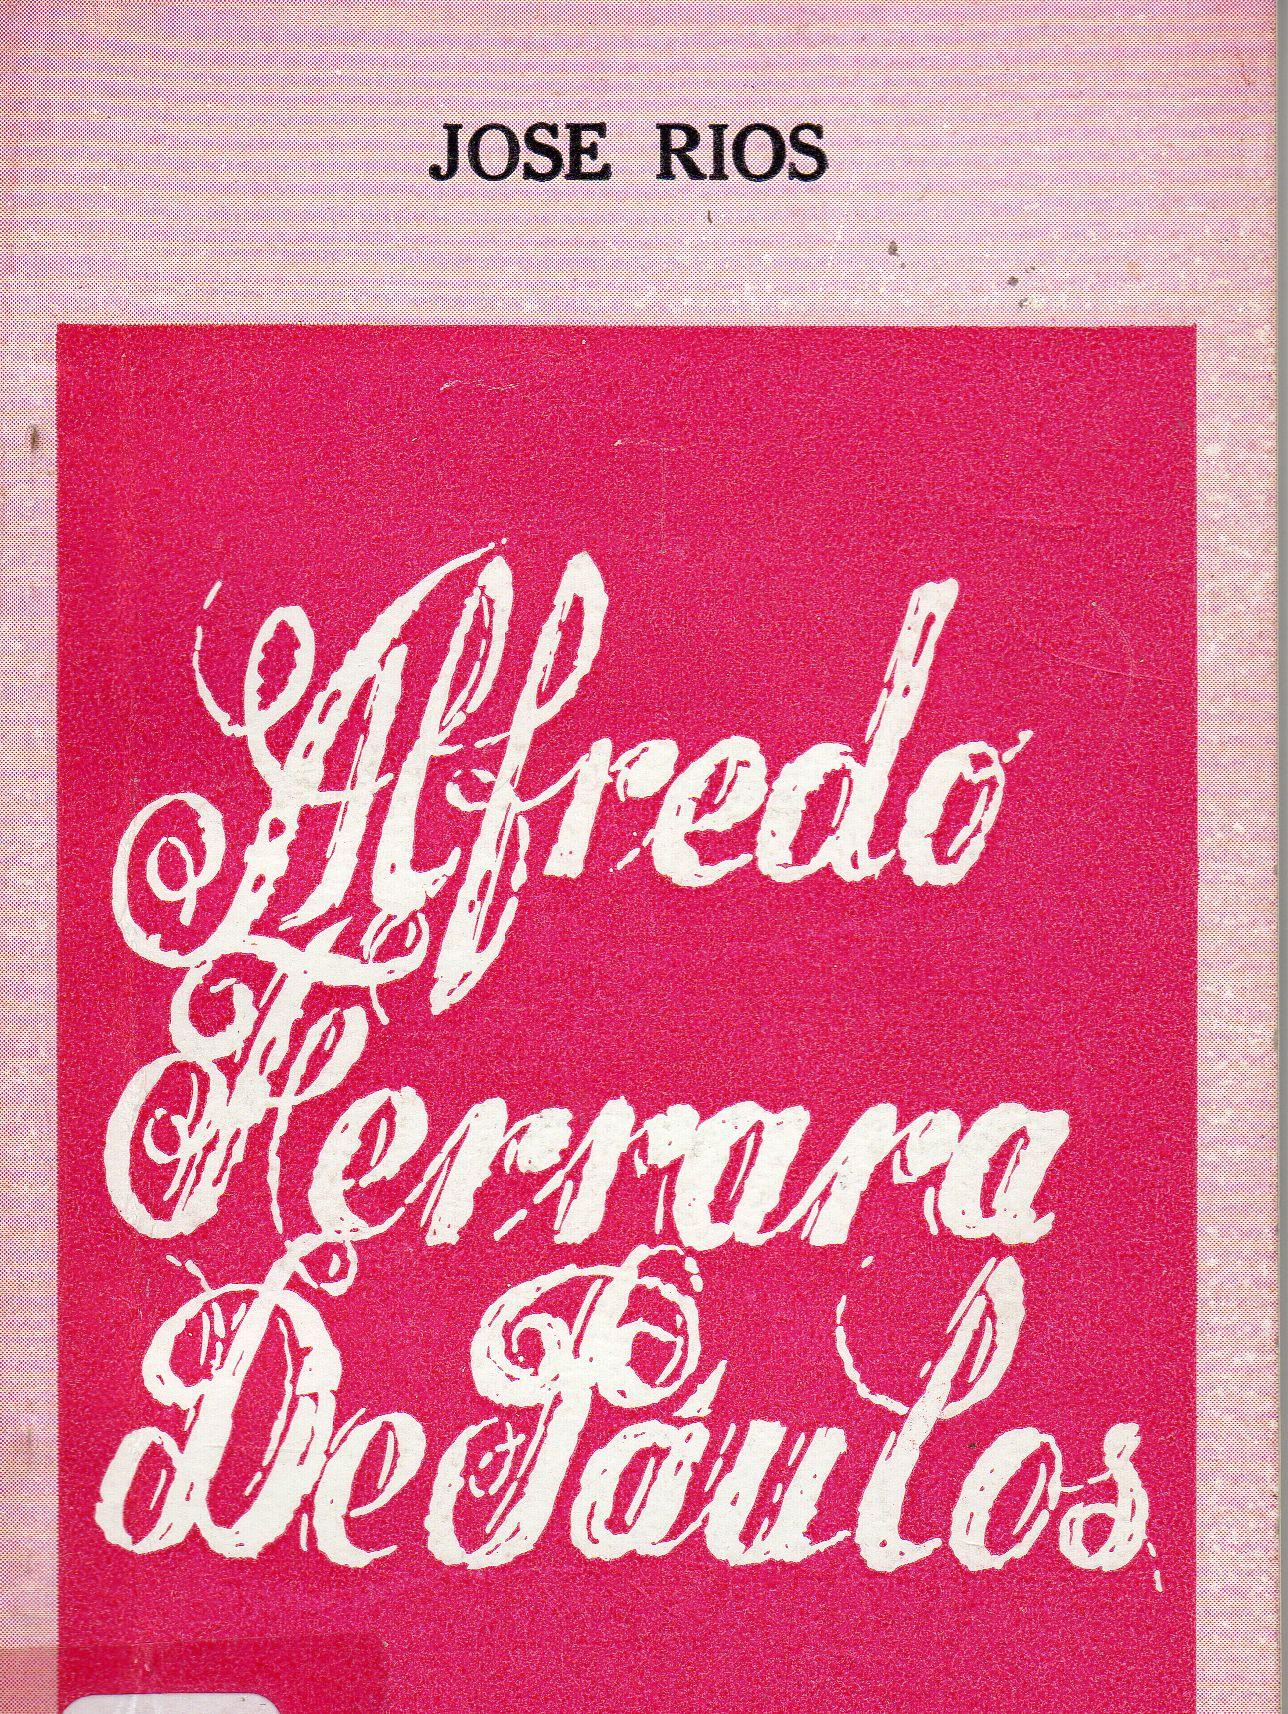 Alfredo Ferrara de Paulos